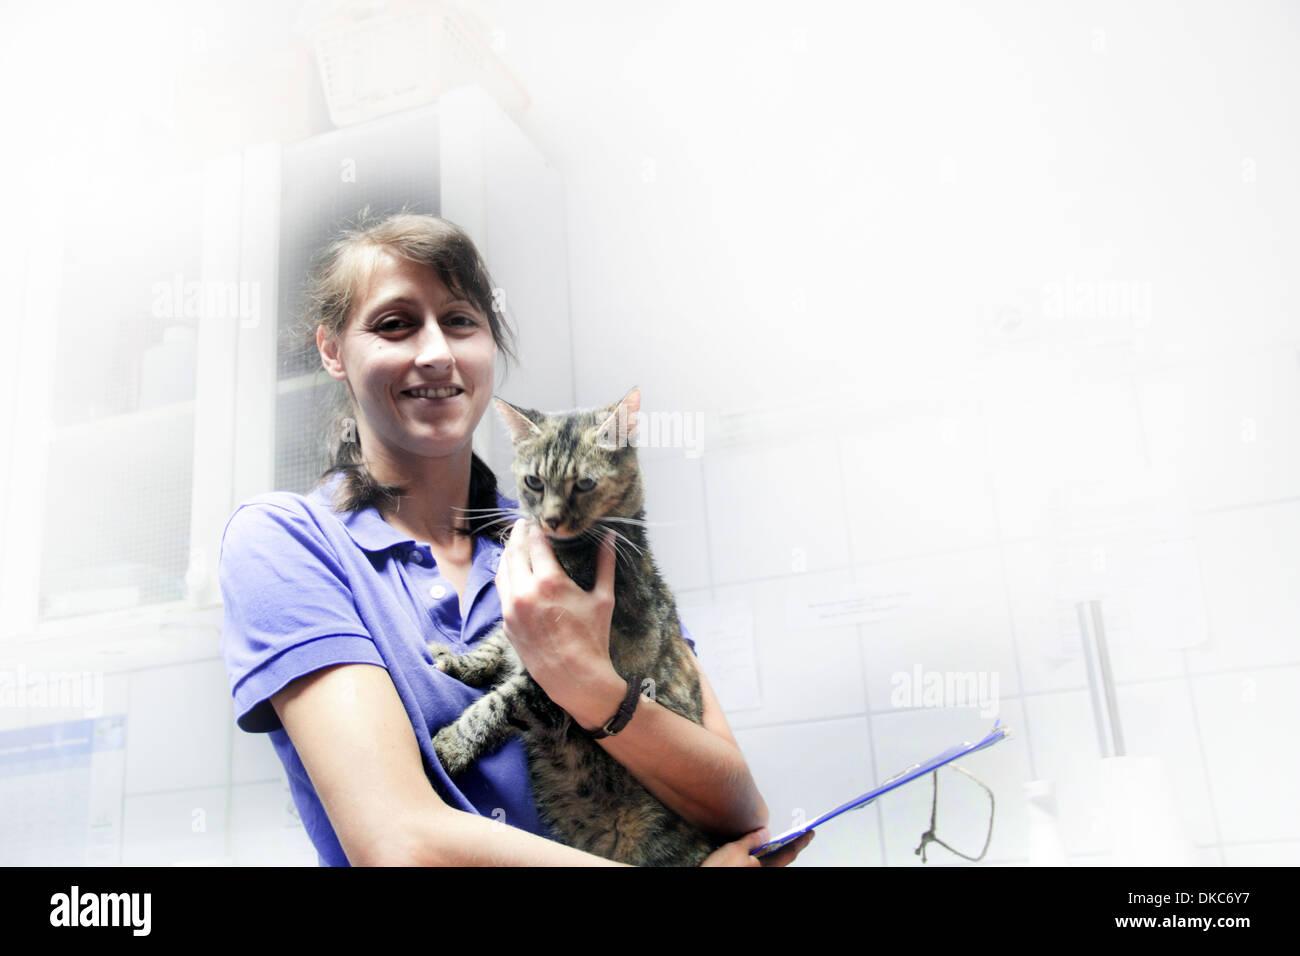 Vet holding domestic cat - Stock Image